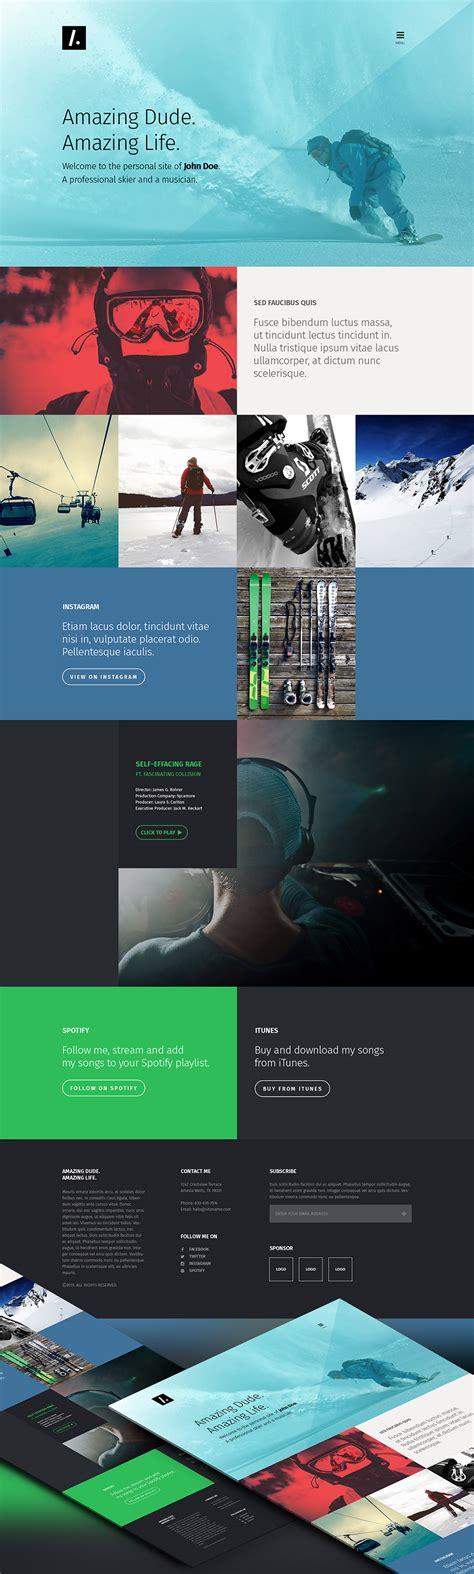 free portfolio website templates one page personal portfolio website template free psd at downloadfreepsd